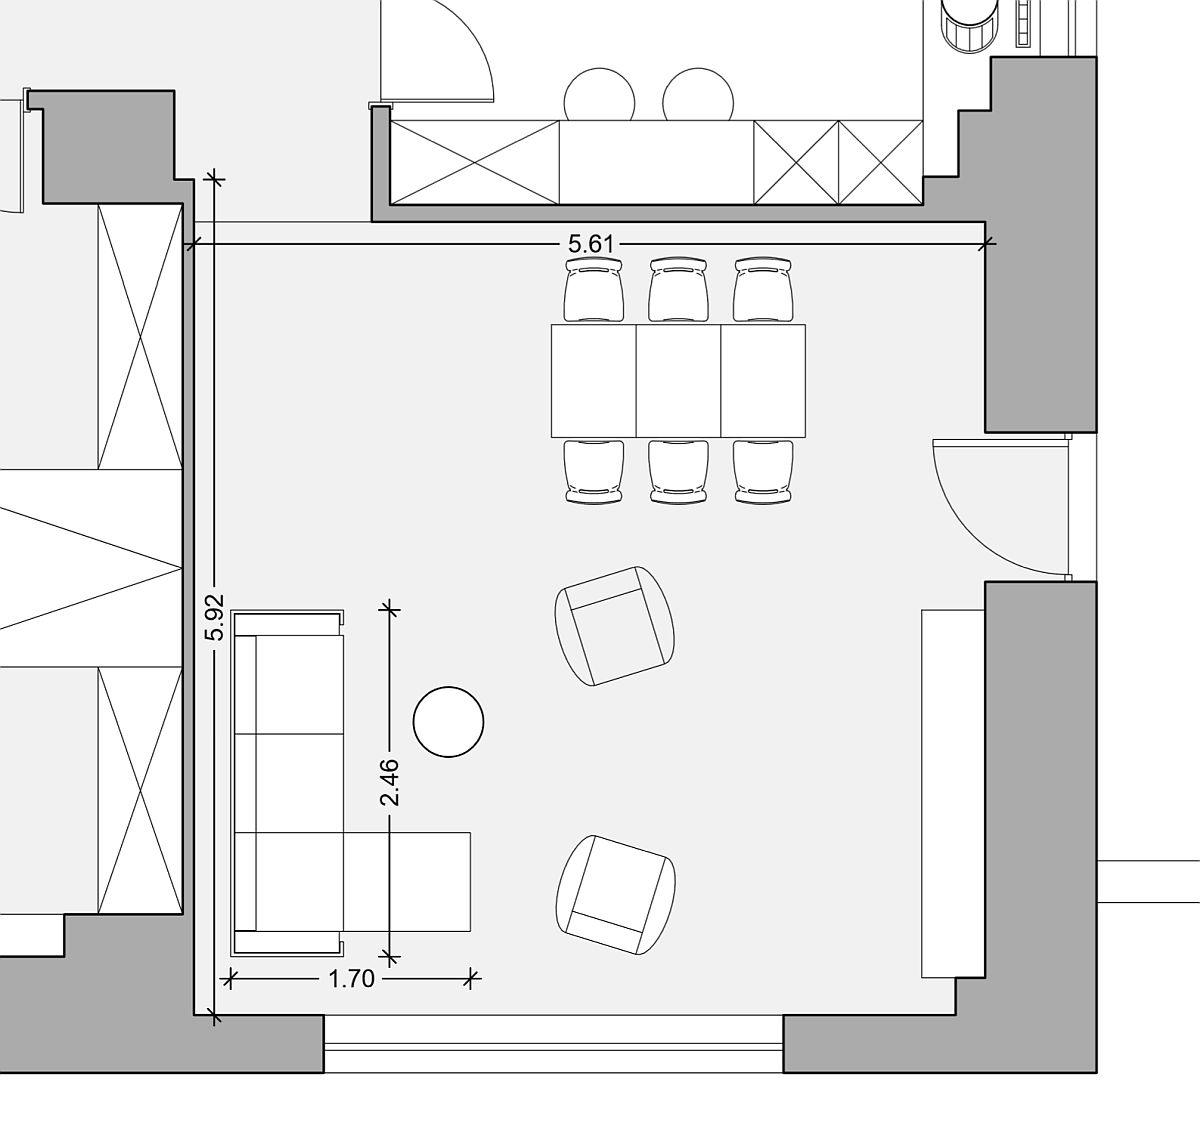 adelaparvu.com despre canapeaua potrivita in functie de spatiu, canapea coltar